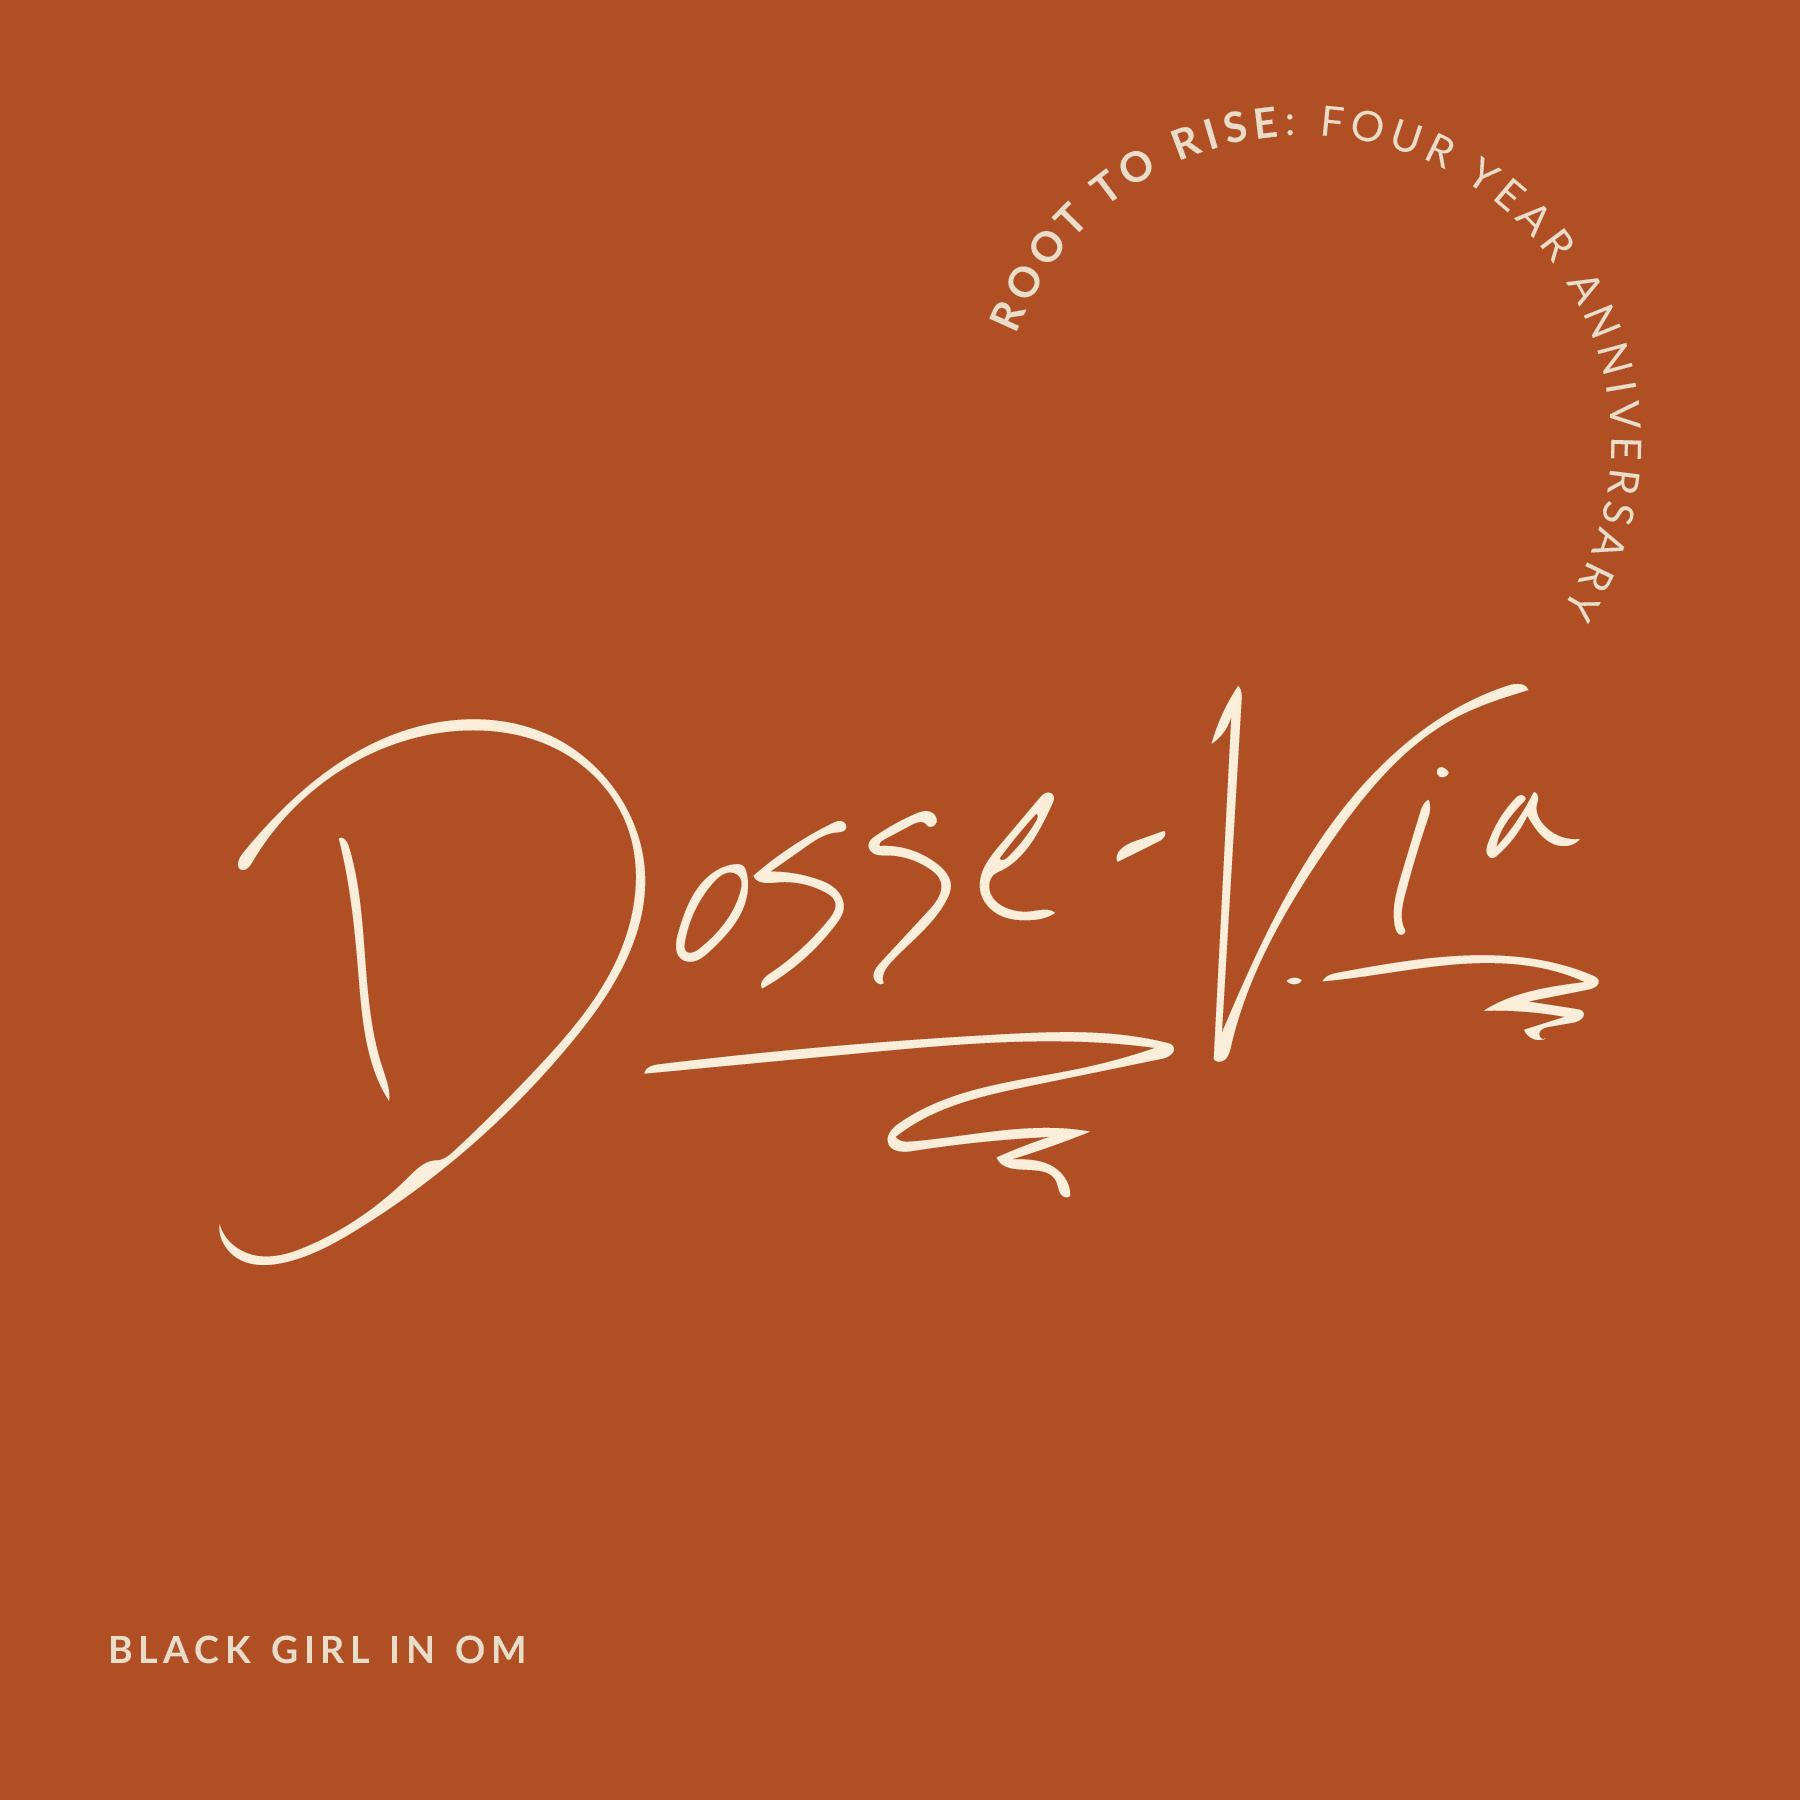 Dosse-Via Root to Rise Name.jpg